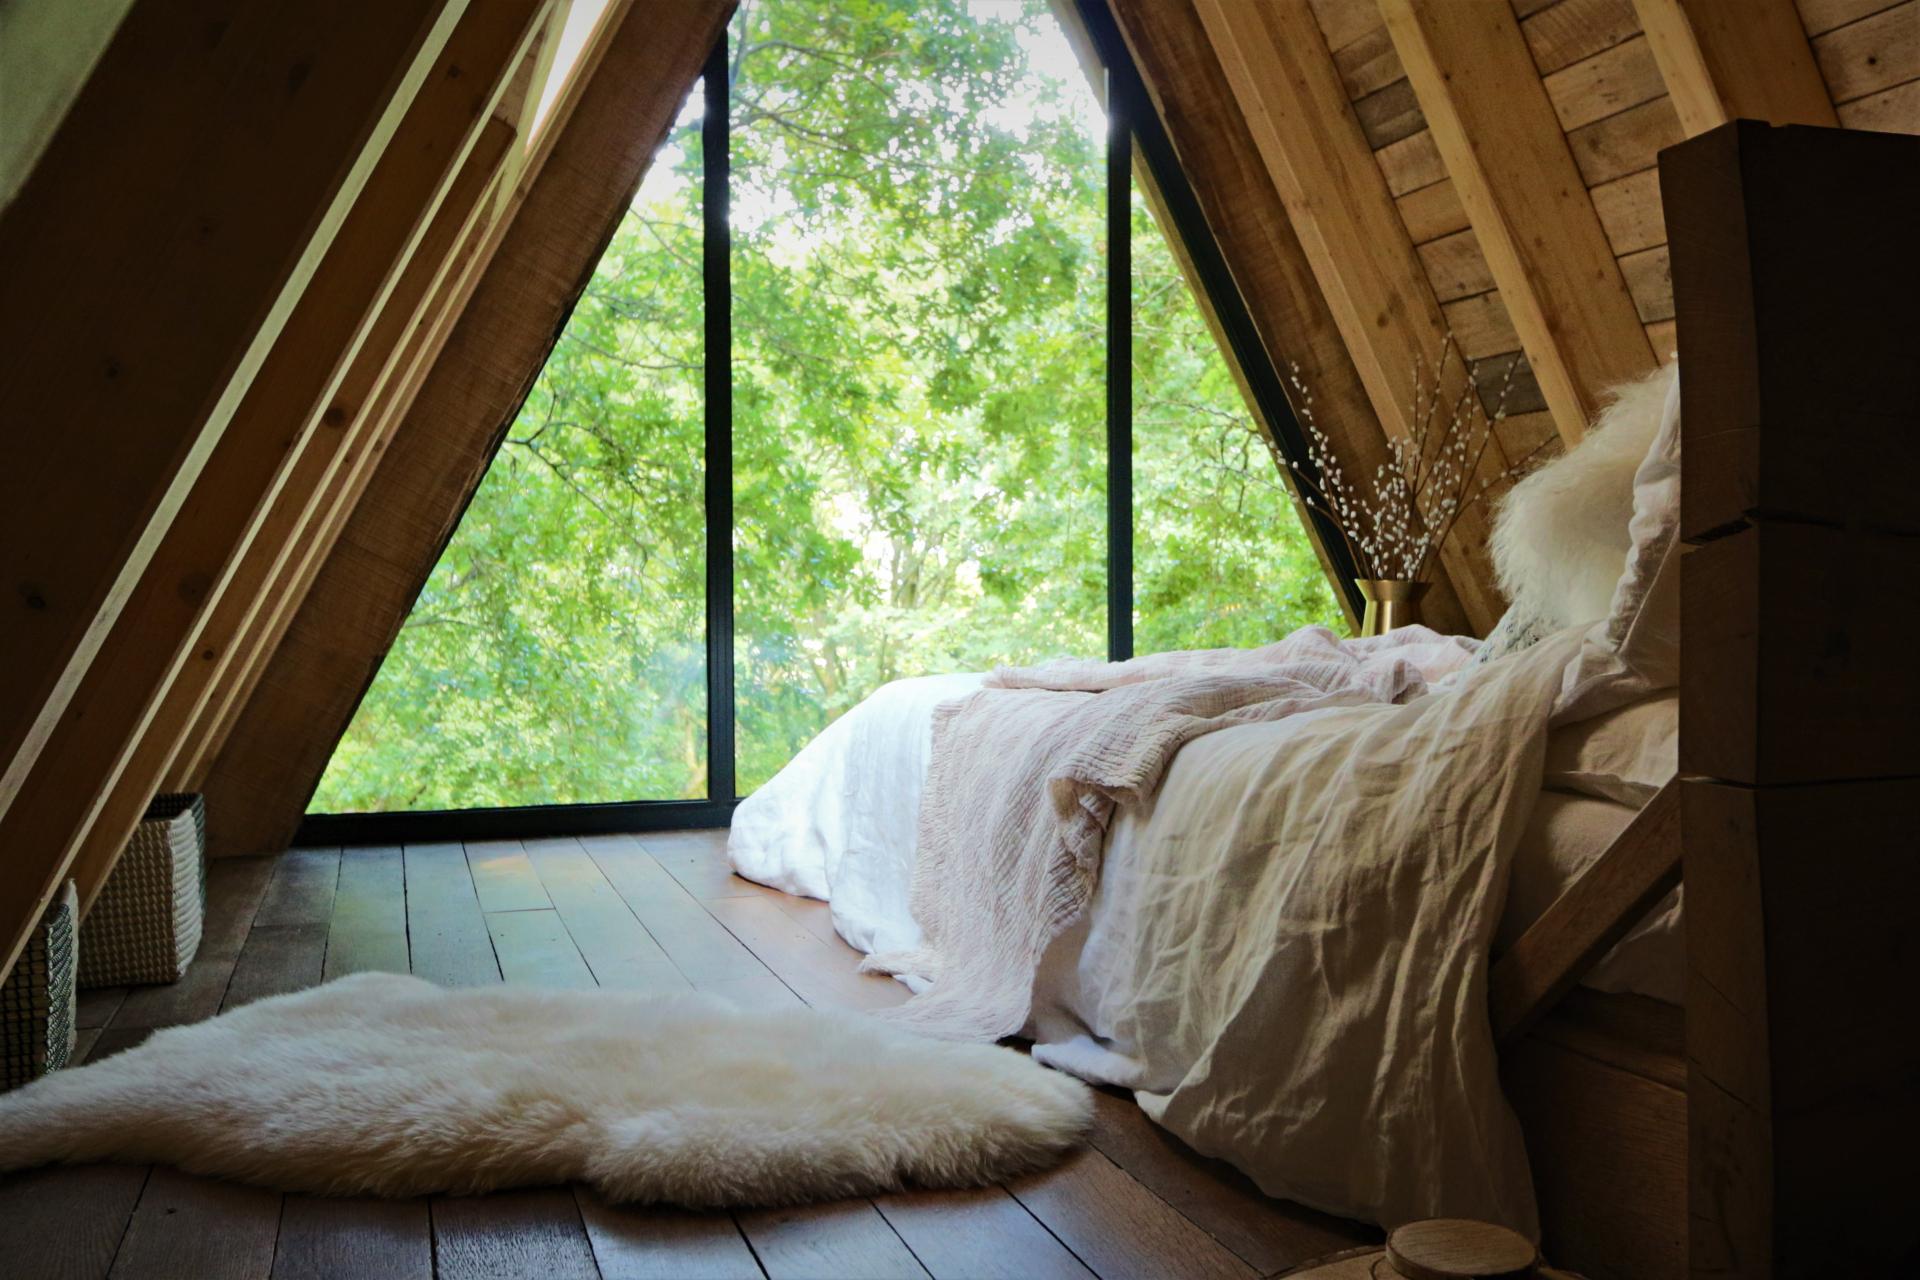 Sleep in the Treetops - Luxury Treehouse Breaks in the UK